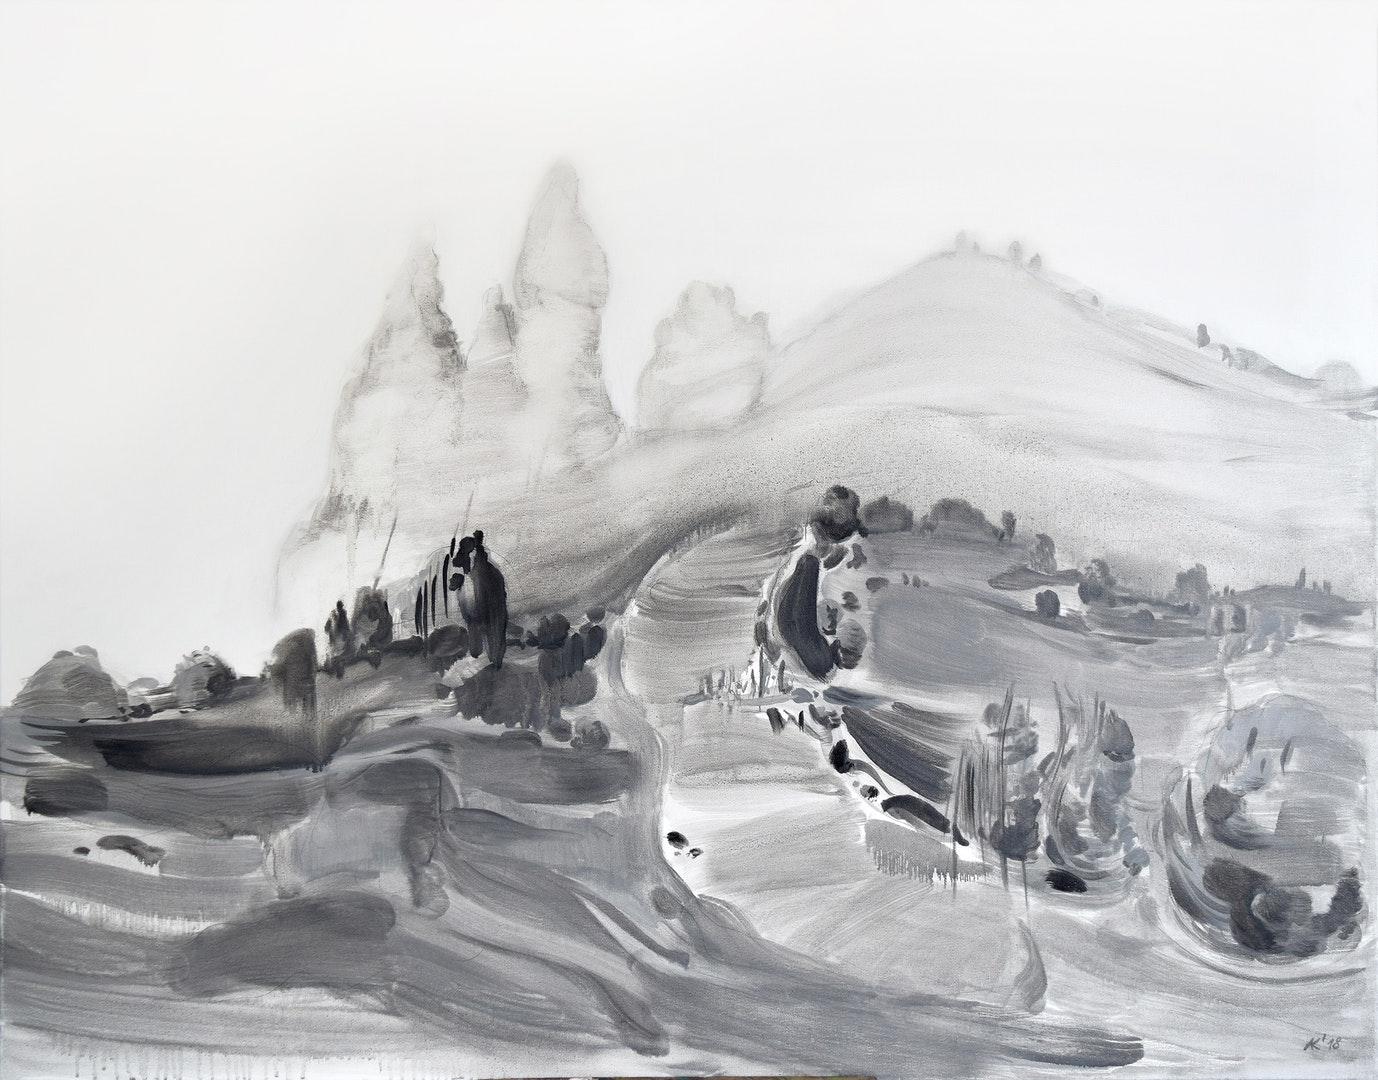 Asta Kulikauskaite-Krivickiene  Island III  Oil on canvas, 70 x 90 x 2 cm  https://www.facebook.com/astapainting/